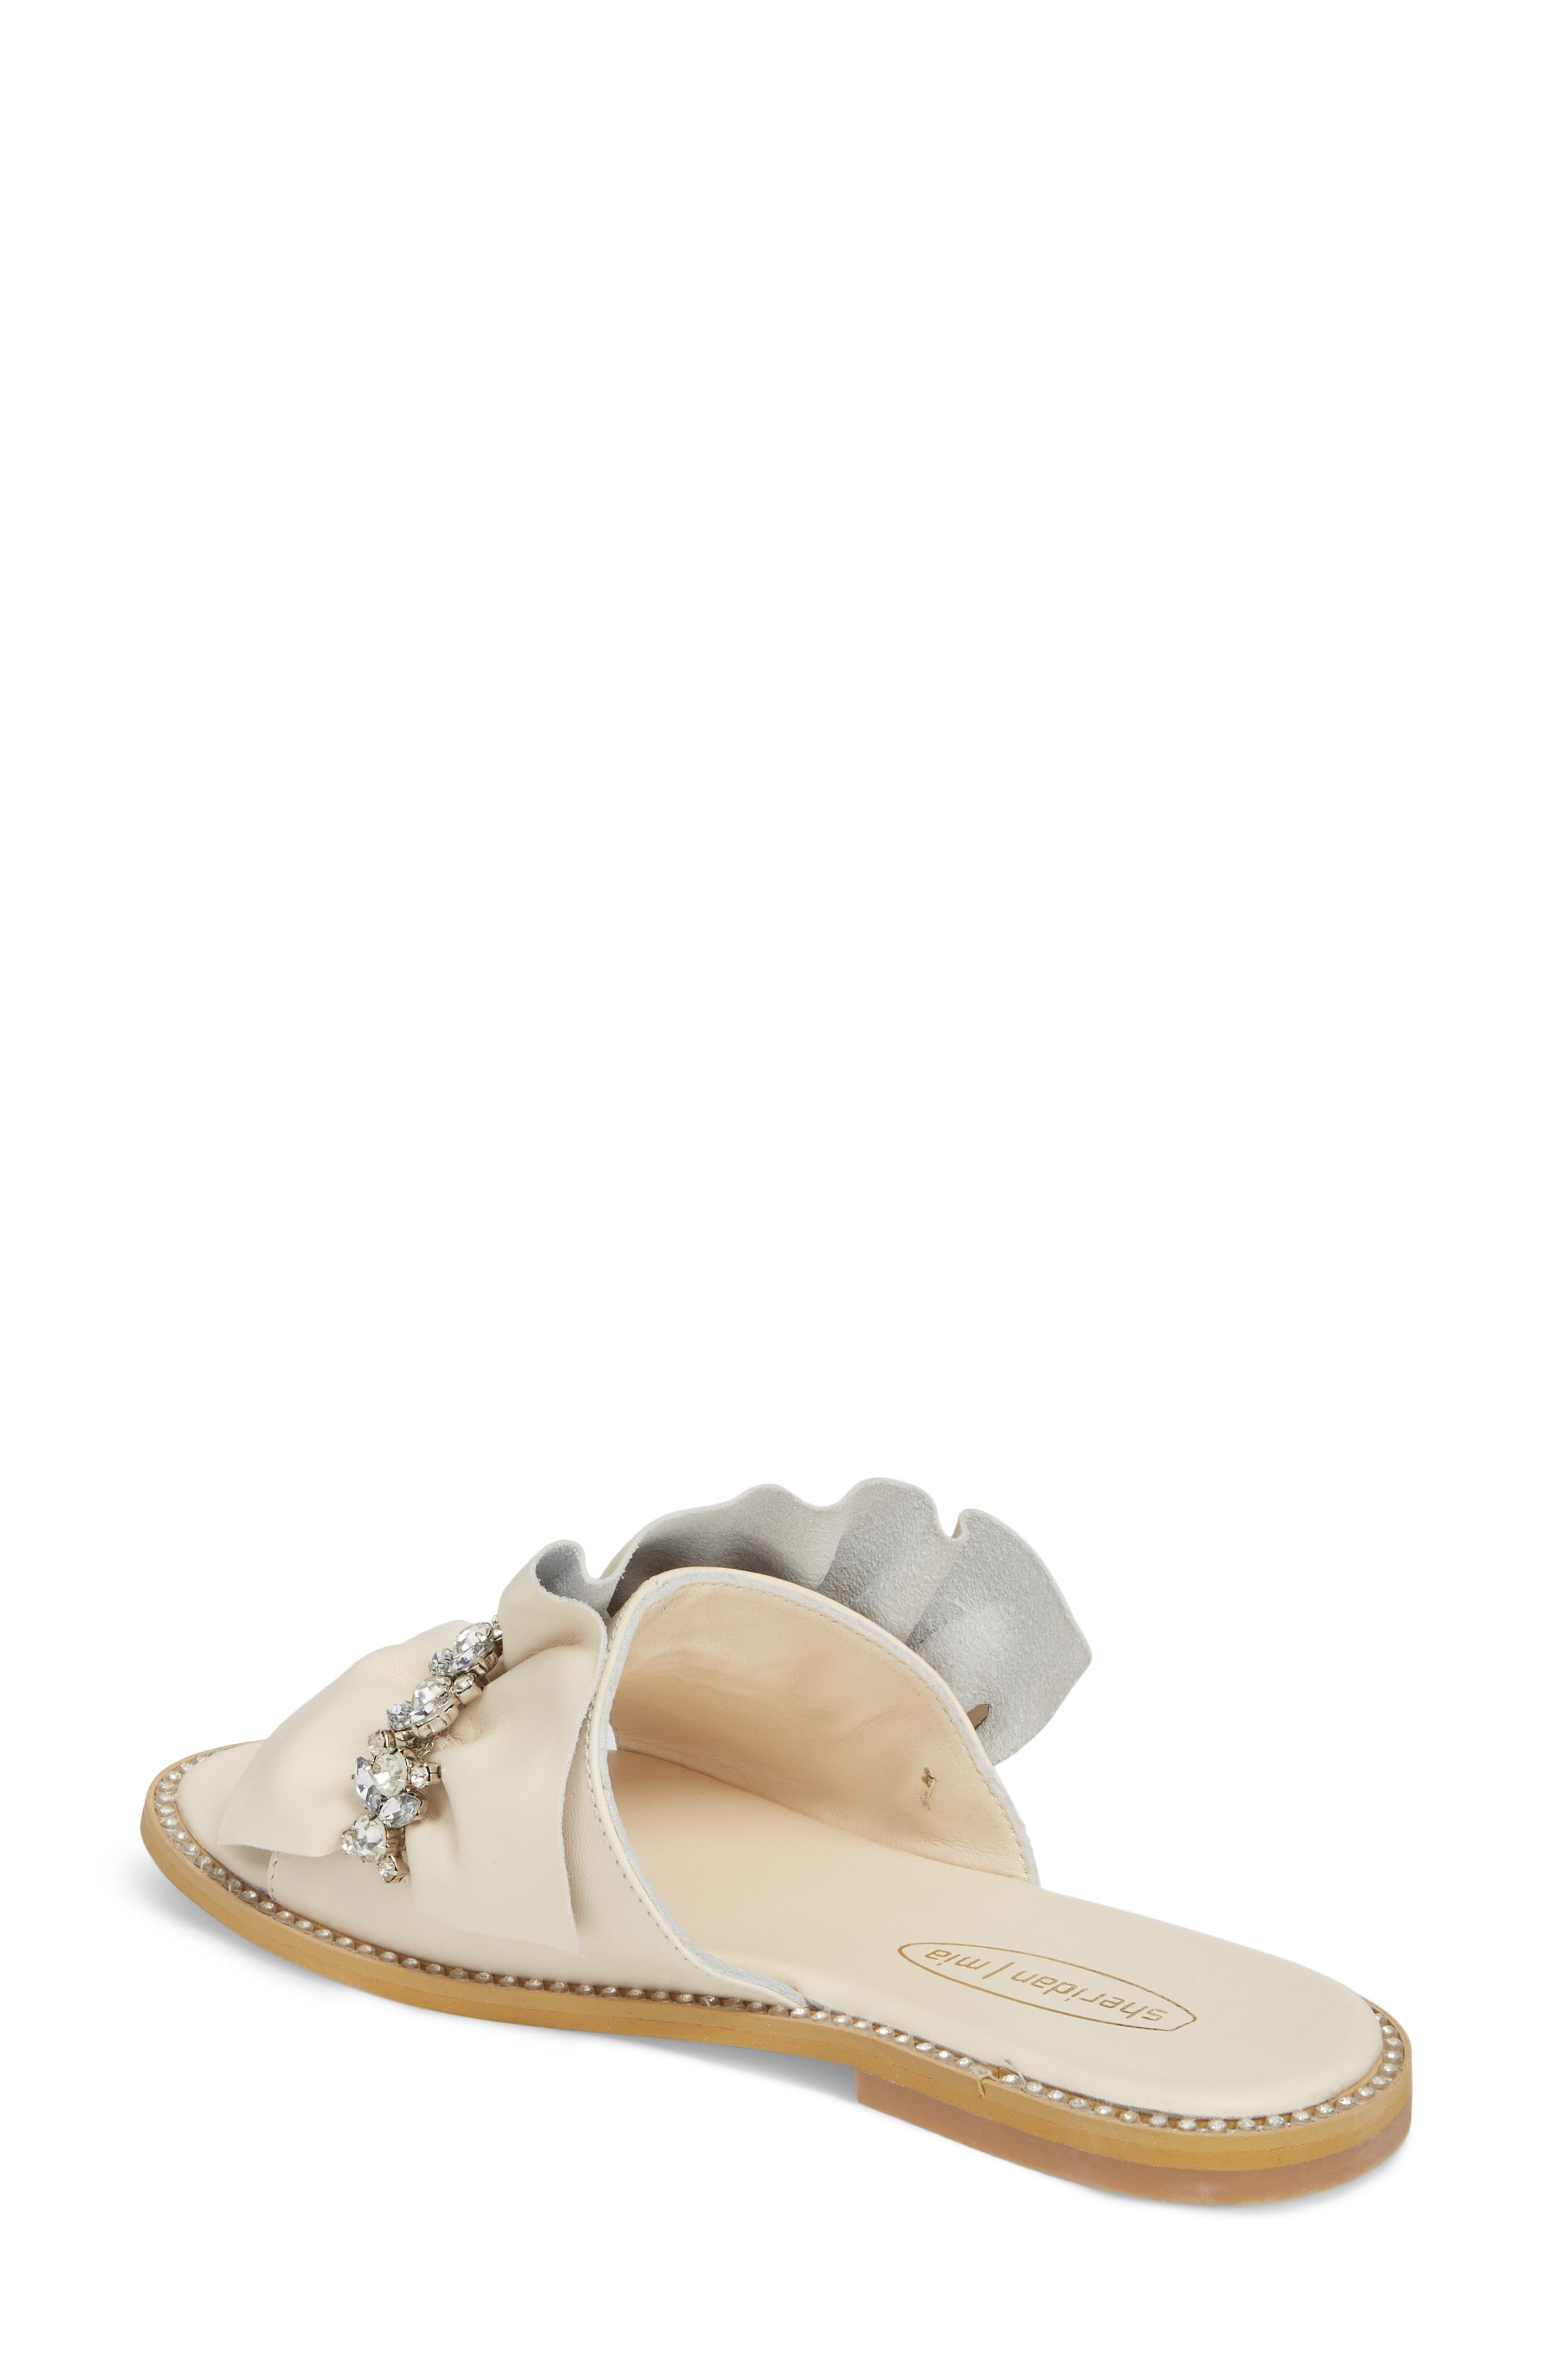 Tiana Crystal Slide Sandal,                             Alternate thumbnail 2, color,                             Cream Leather